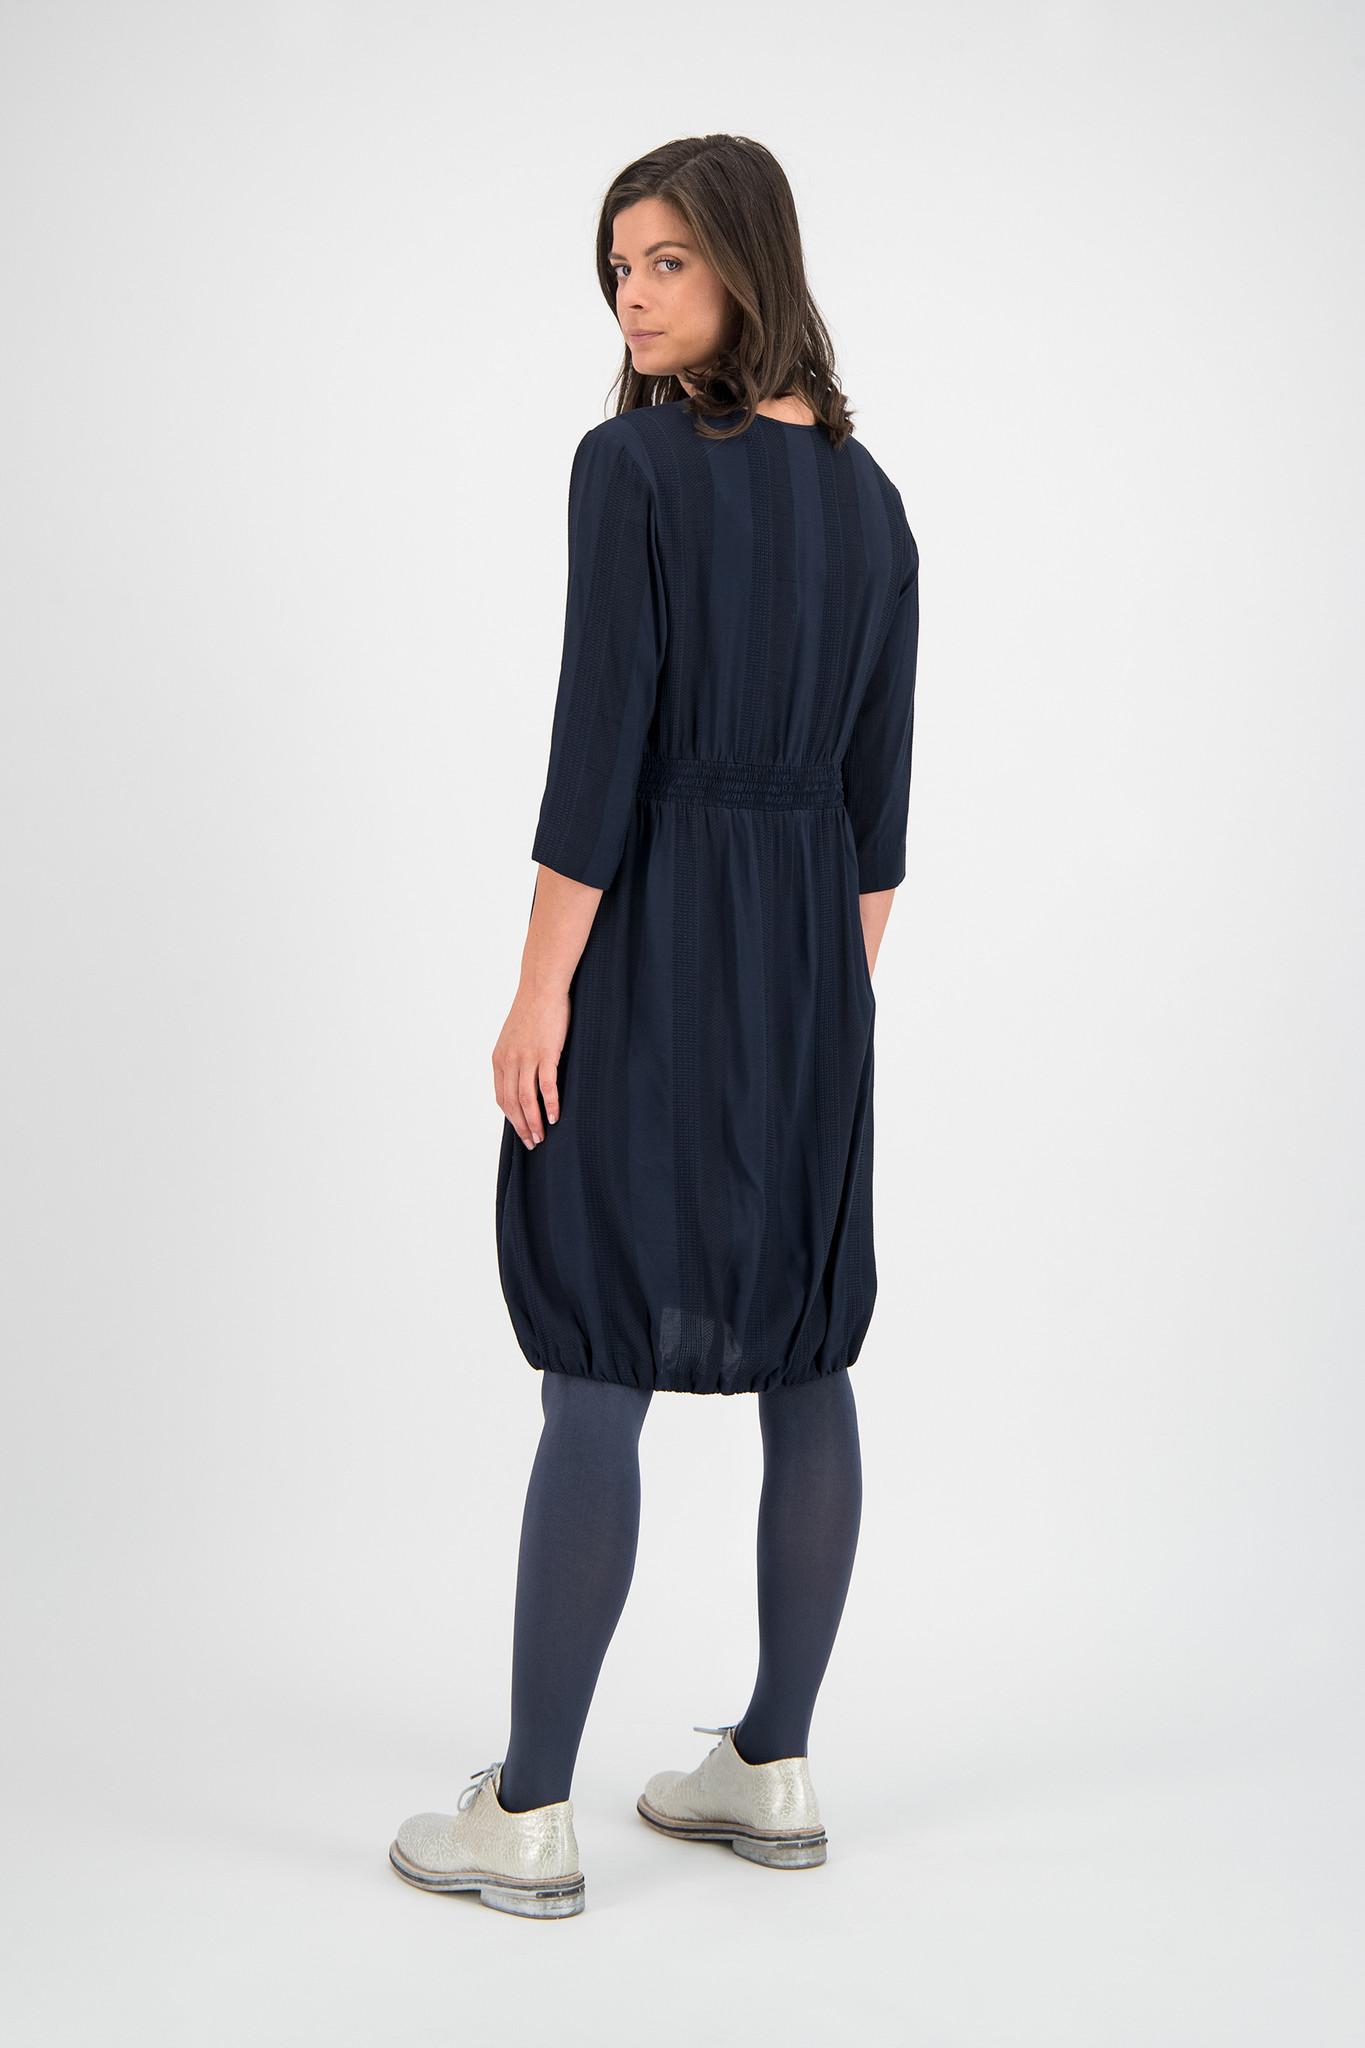 SYLVER Jacquard Stripe Dress Balloon - Dark Blue